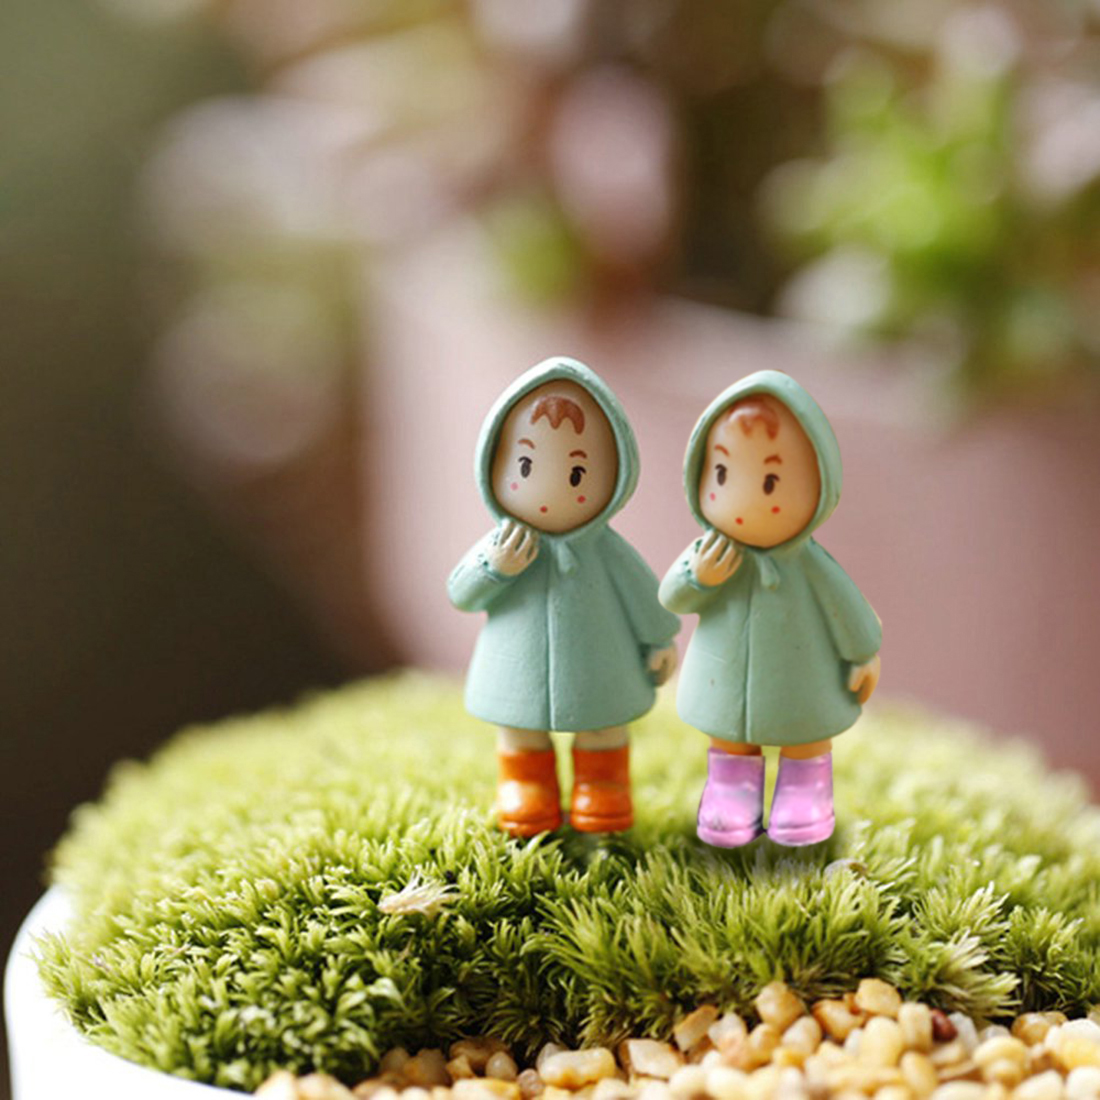 Winsome Mini Figurines Miniature Girl Mei Resin Crafts Ornament Fairygarden Gnomes Moss Terrariums Home Hot Sale Mini Figurines Miniature Girl Mei Resin Crafts